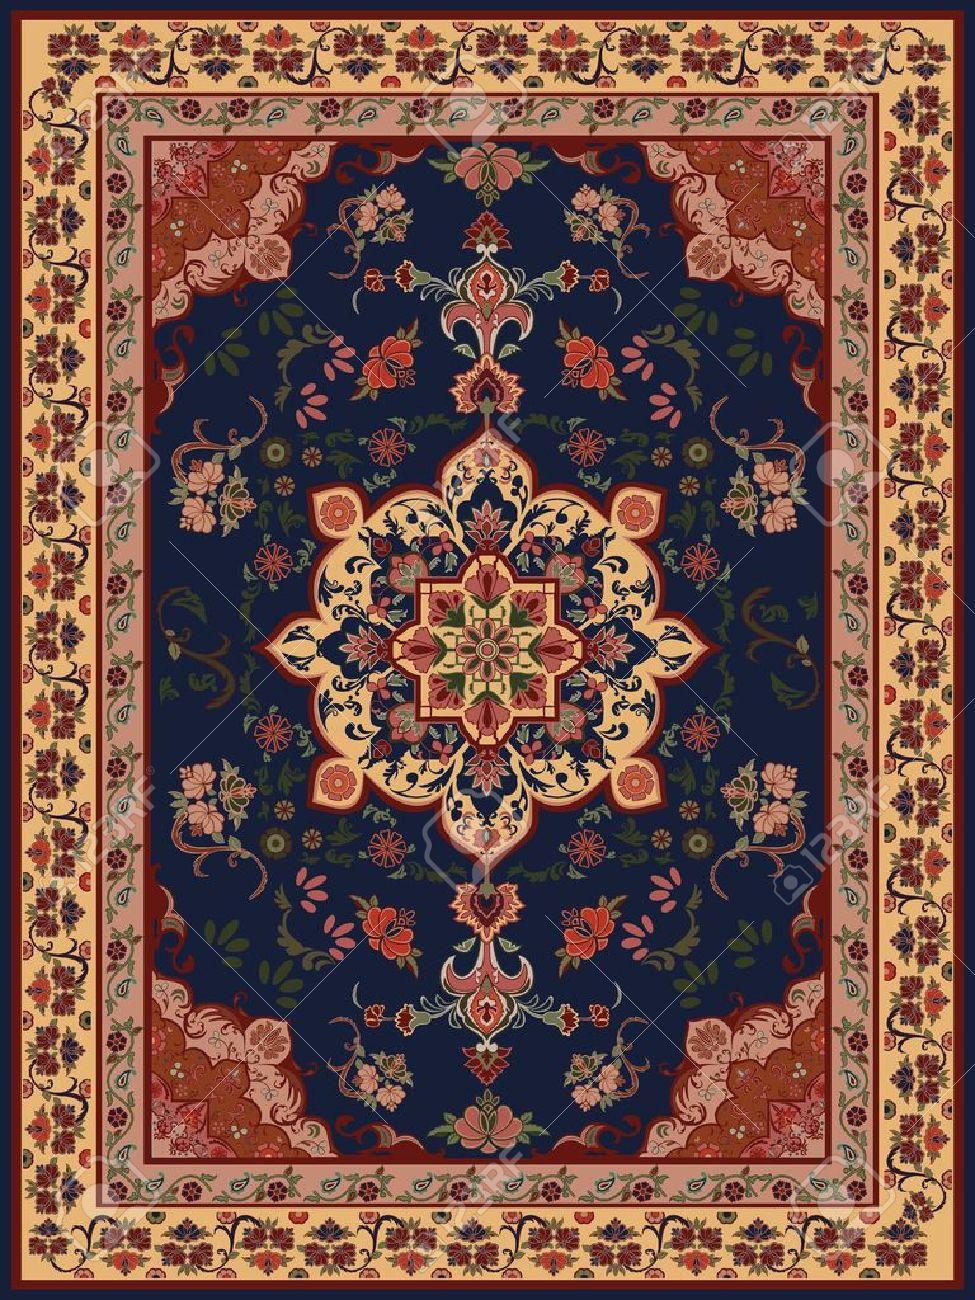 carpet design images oriental floral carpet design stock vector - 11431921 NJQEZXR